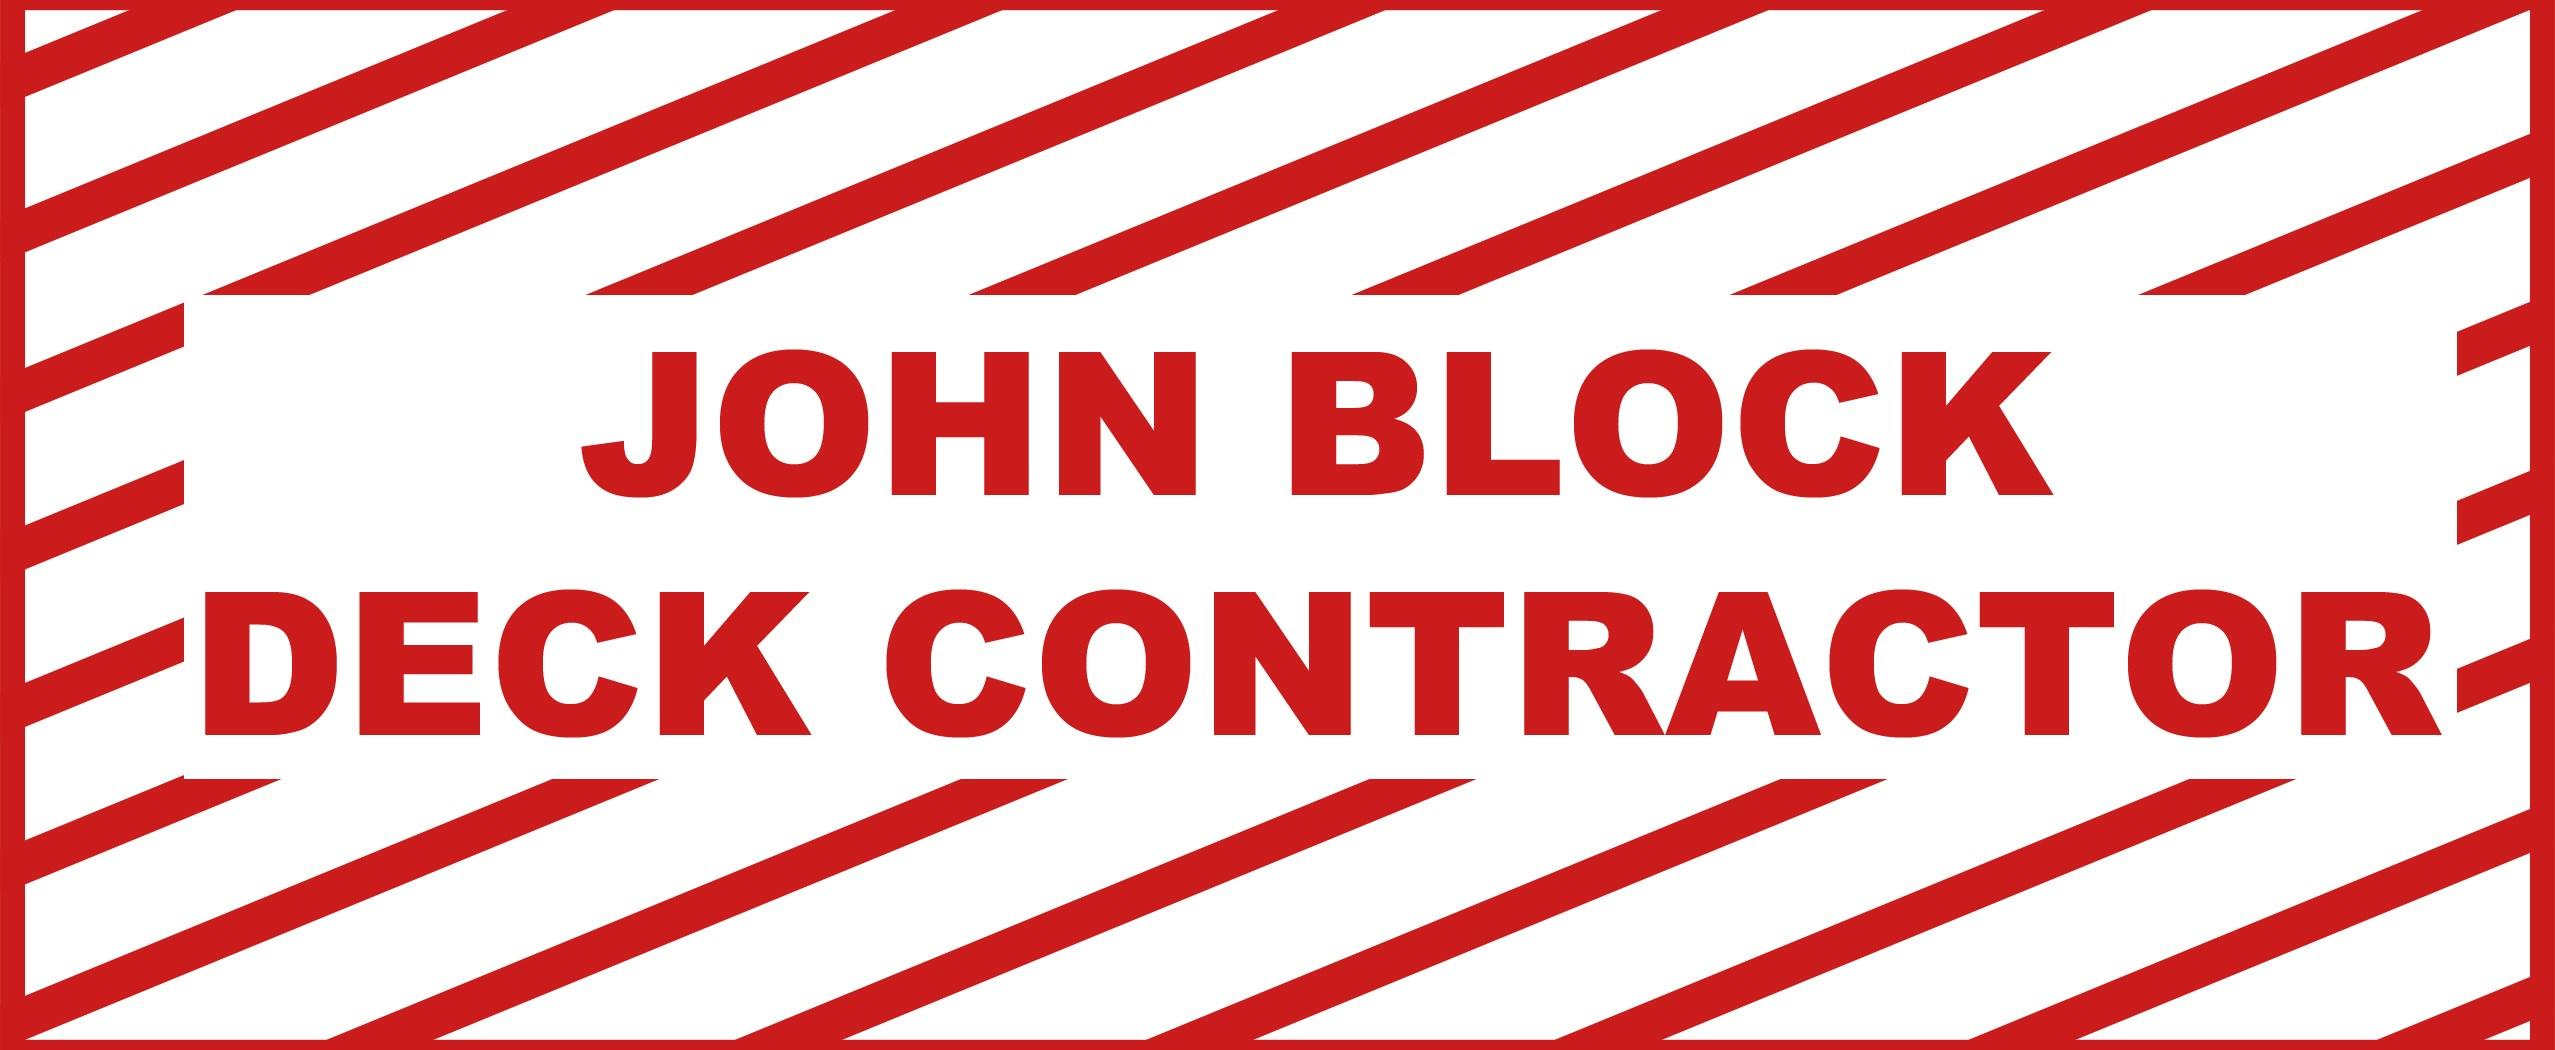 JOHN BLOCK DECK CONTRACTOR logo